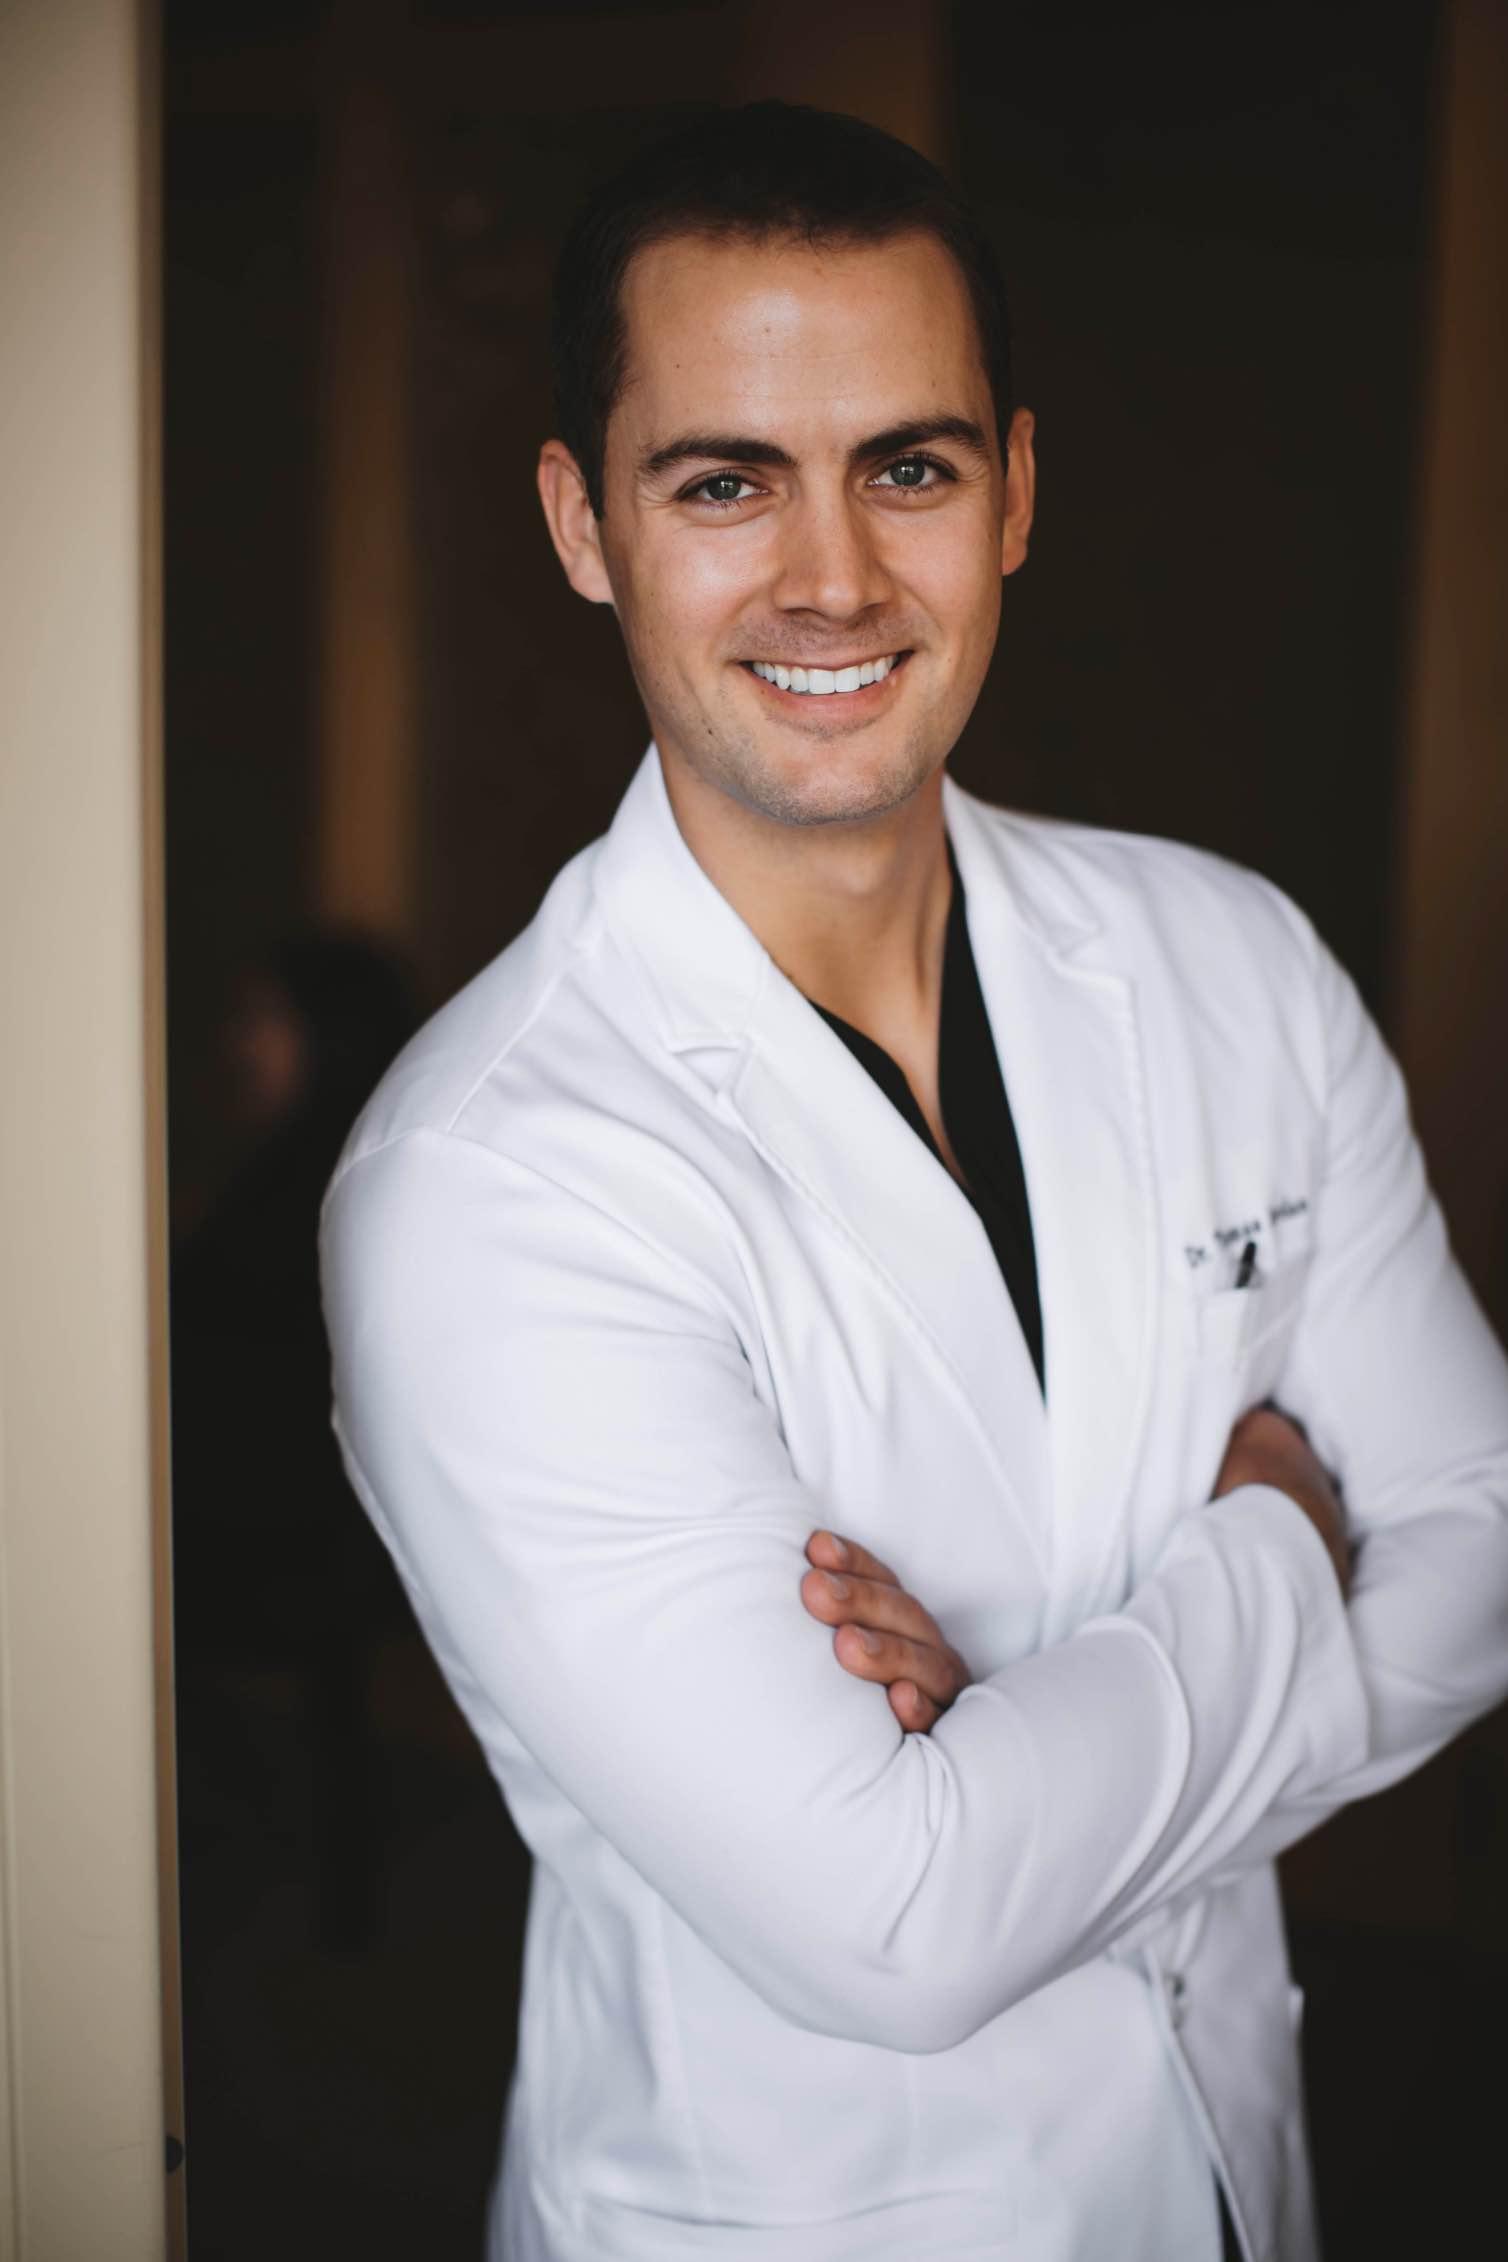 Photo of Westminster CO dentist Dr. Thomas Jordan